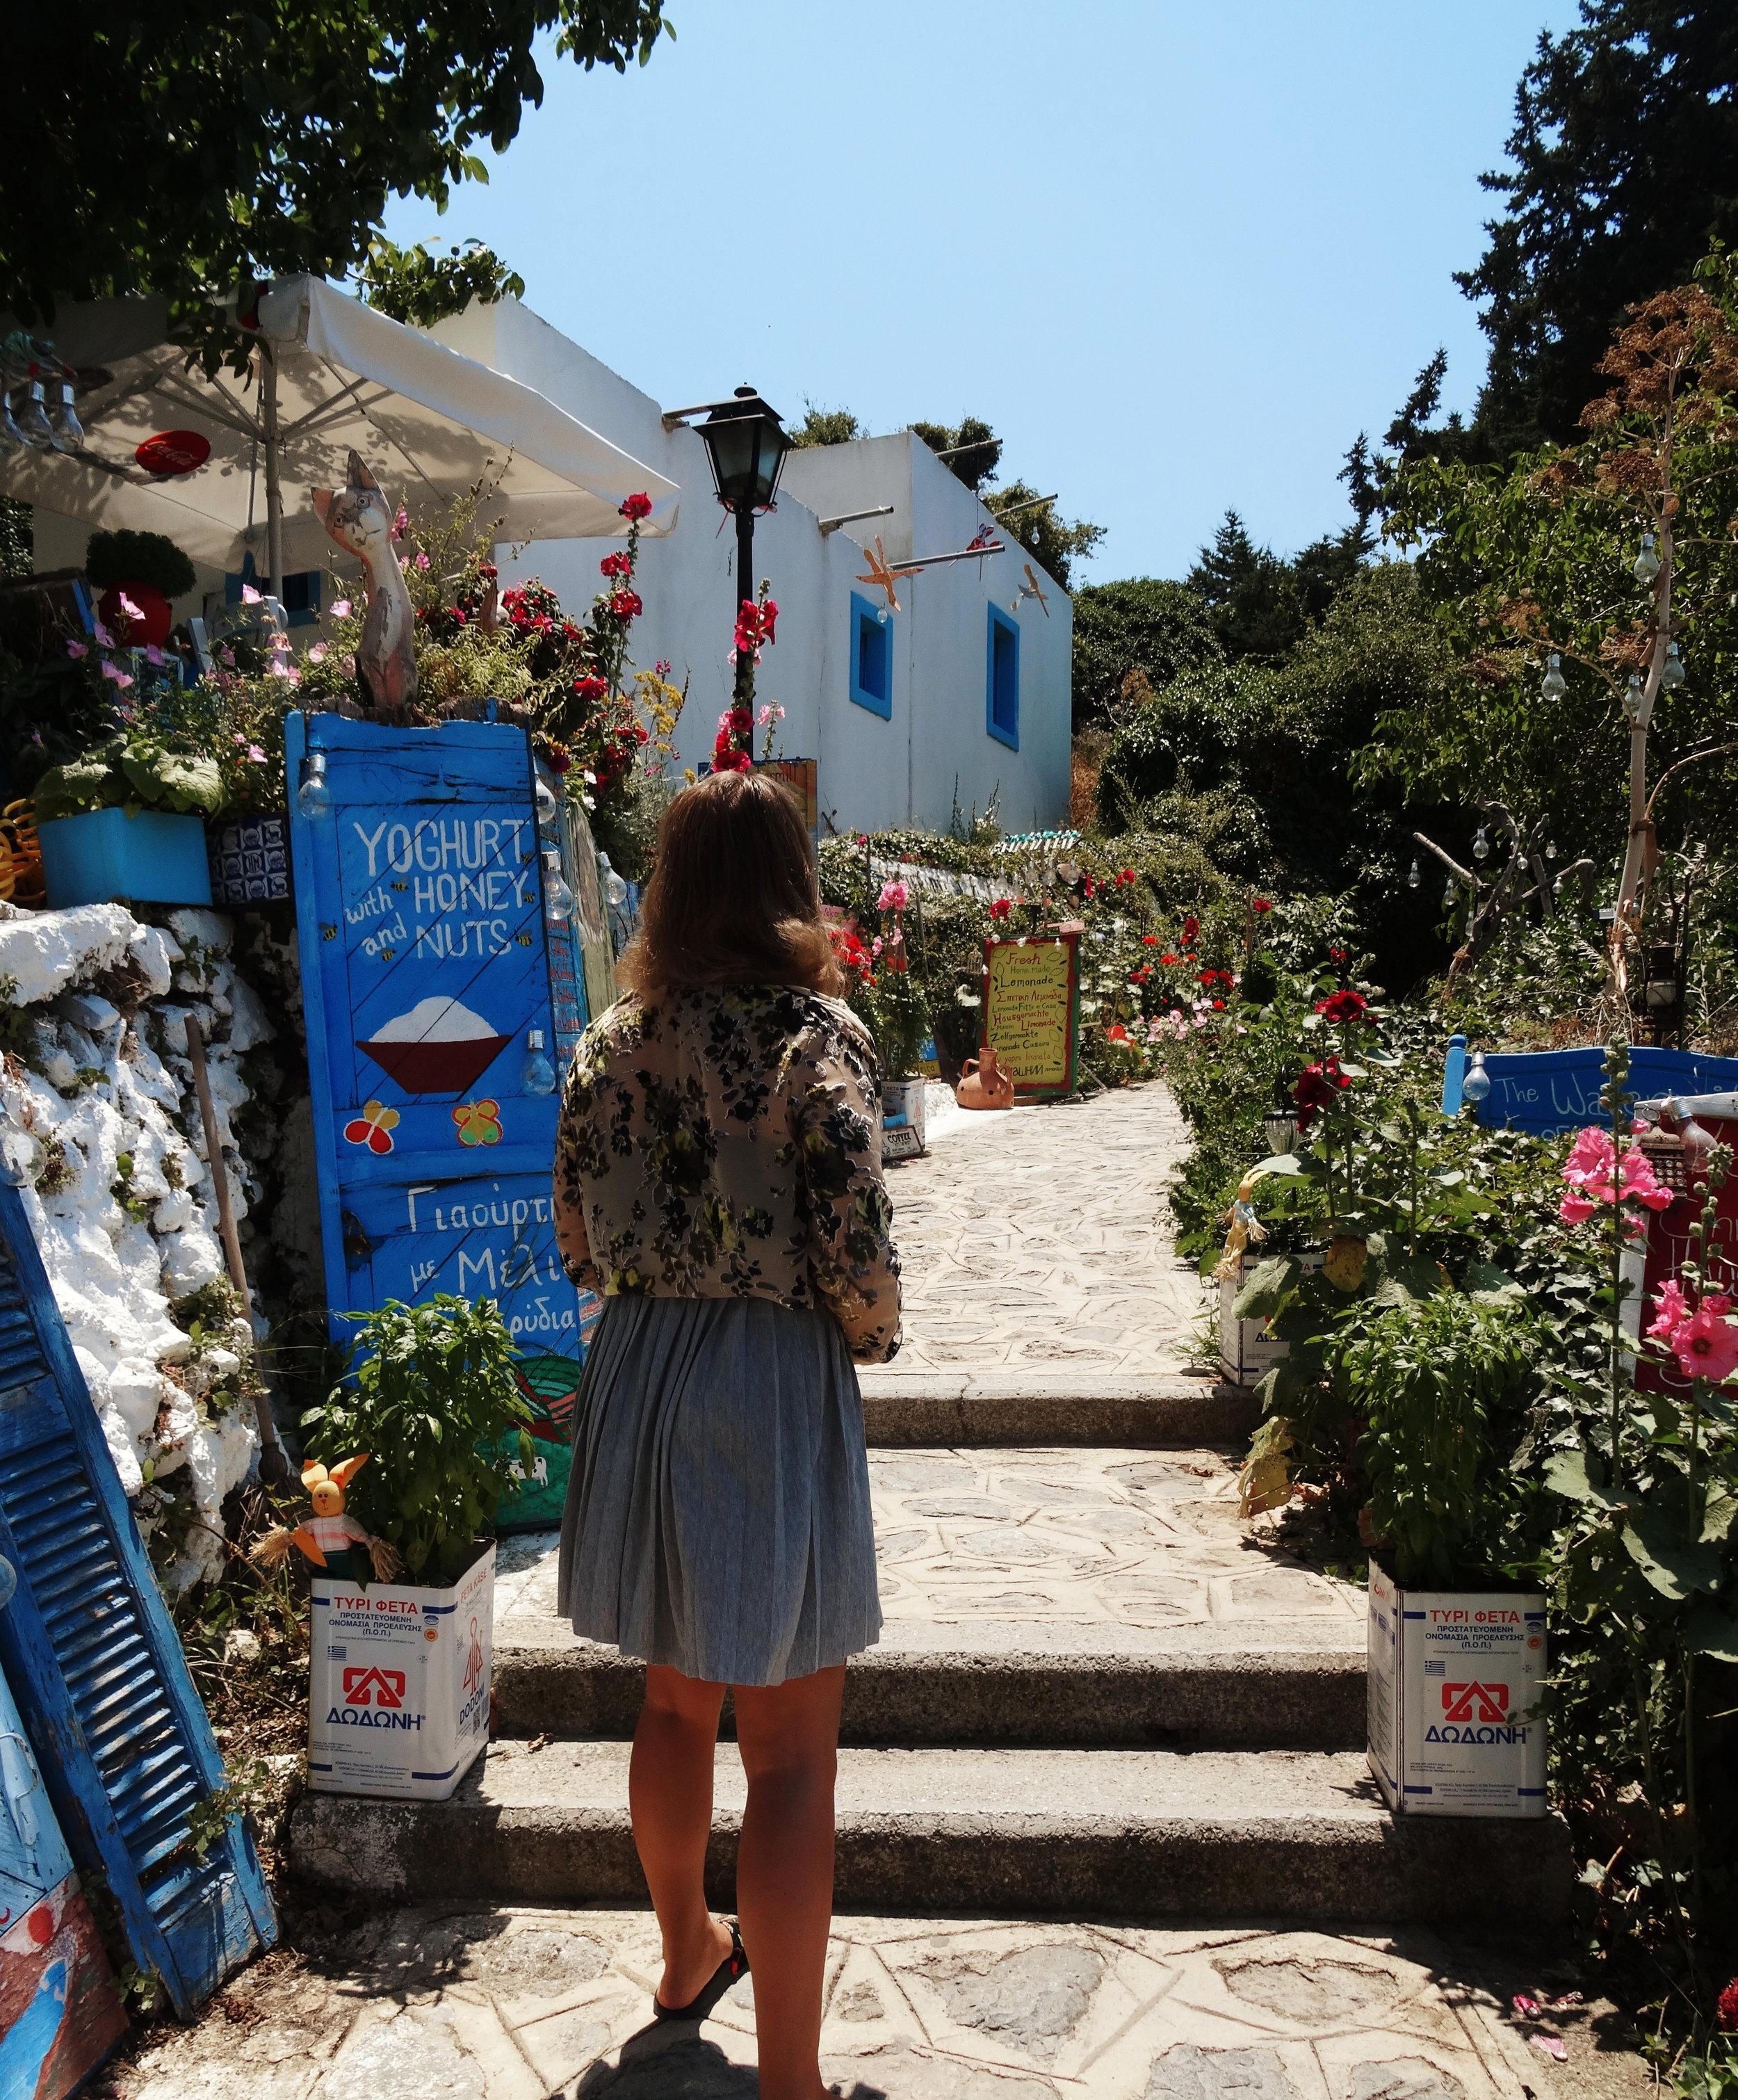 zia-kokemuksia-kos-kreikka-mona-kajander-matkablogi